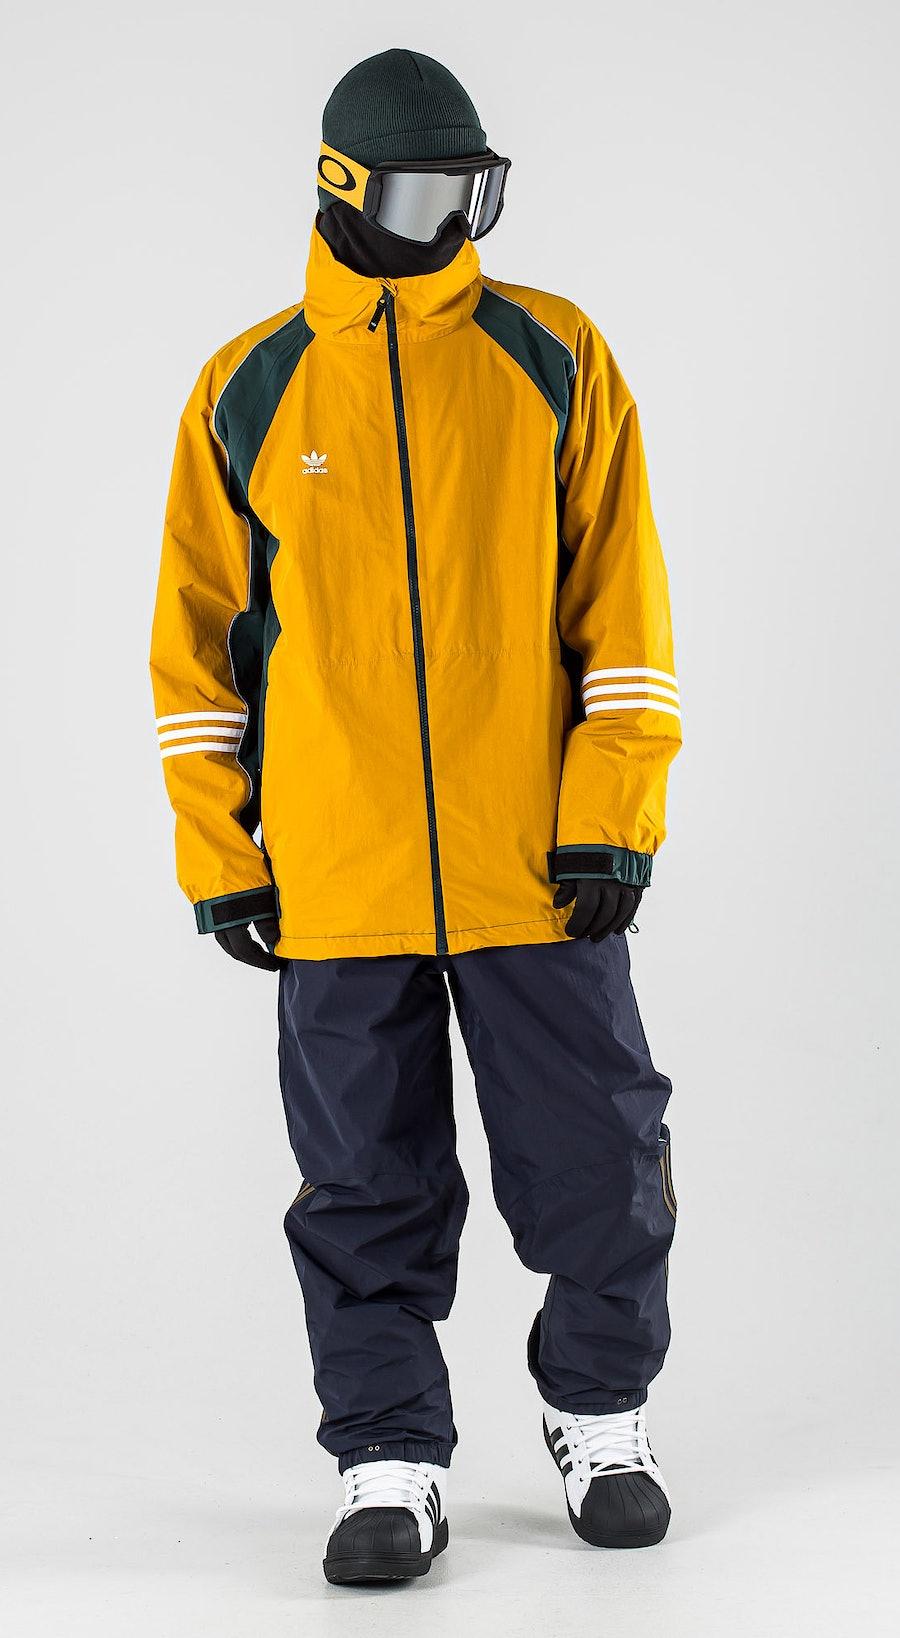 Adidas Snowboarding 10K DNA Legacy Gold/Mineral Grey/White Vêtements de Snowboard  Multi